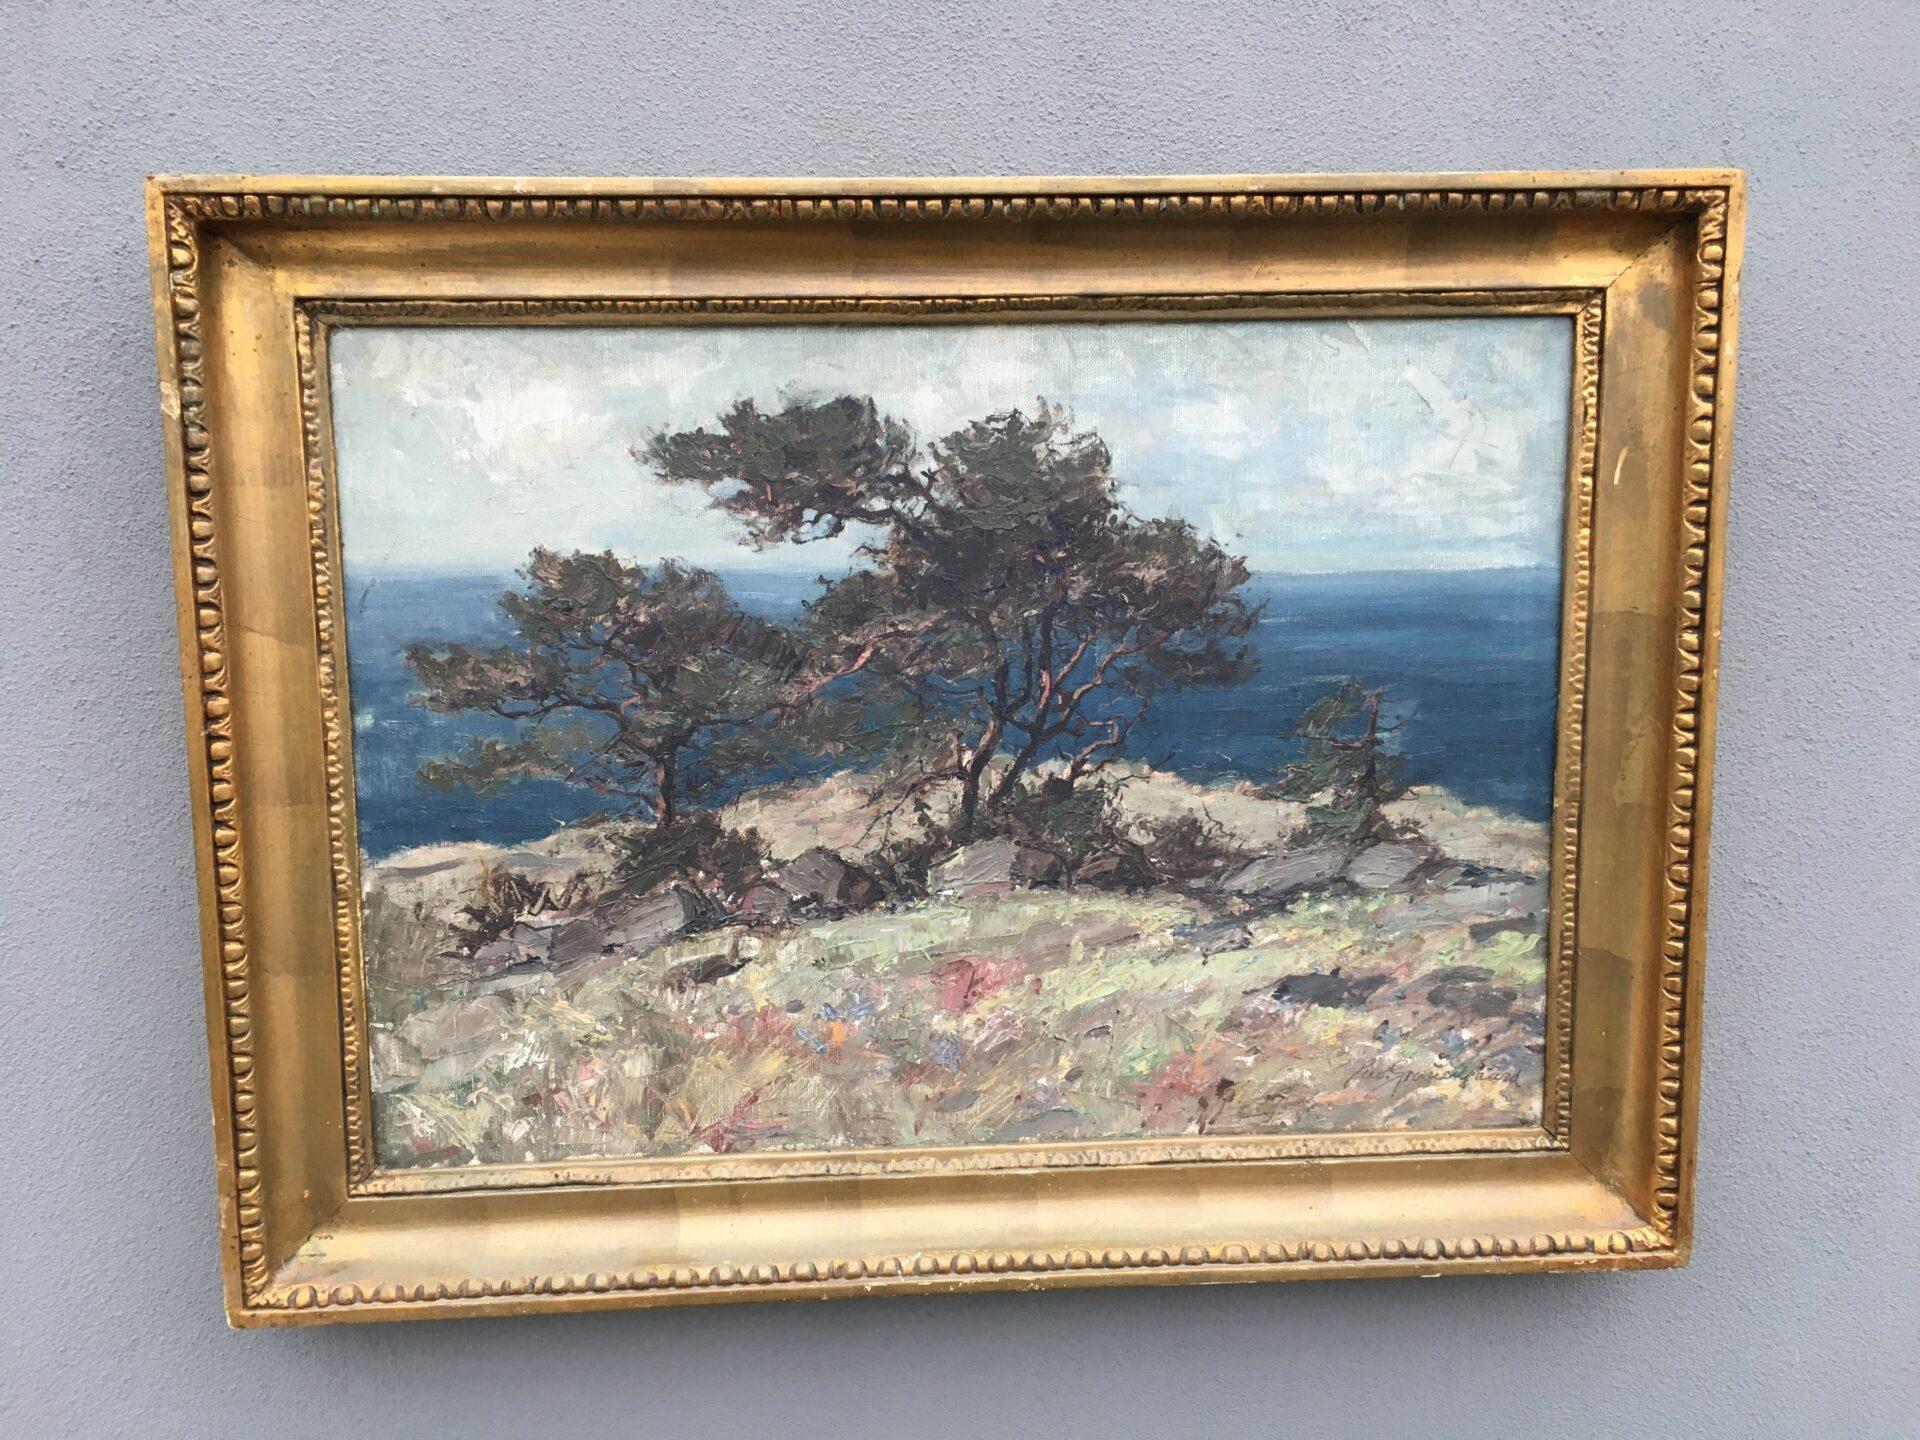 Utydeligt signeret maleri, antageligt Ewald Grauengaard,  i org. Damborg ramme, 56x77  pris 1000k